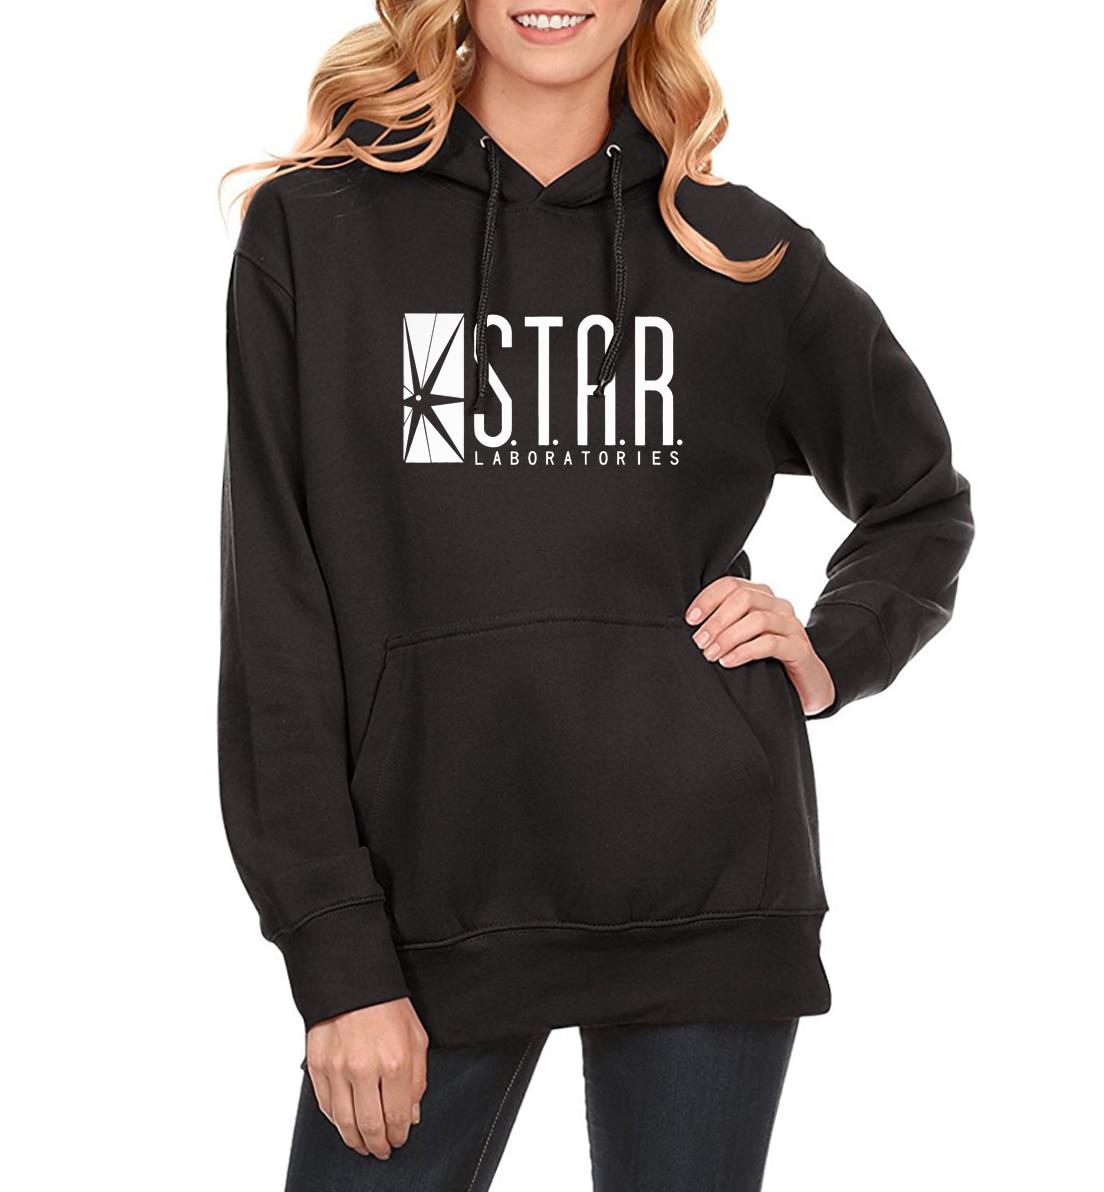 STAR S.T.A.R.Labs Fashion Hoody For Women 2018 Spring Fleece Pullover Female Winter Sweatshirt Brand Clothing Kawaii Sportwear